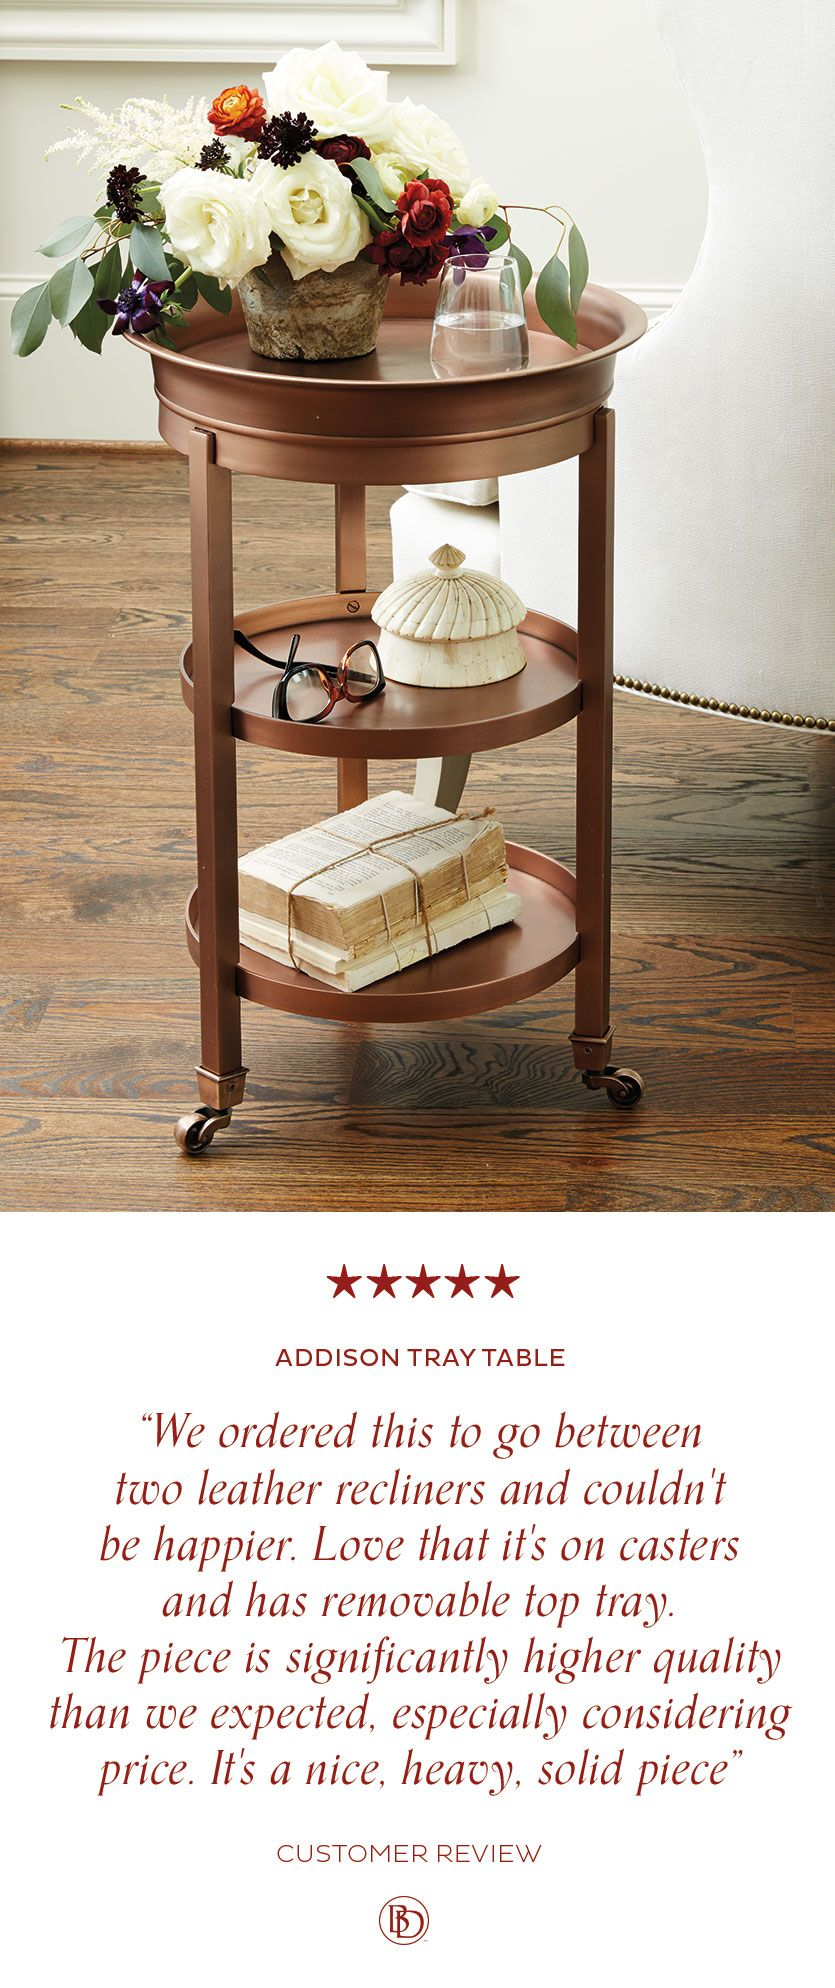 Ballard Designs Addison Tray Table